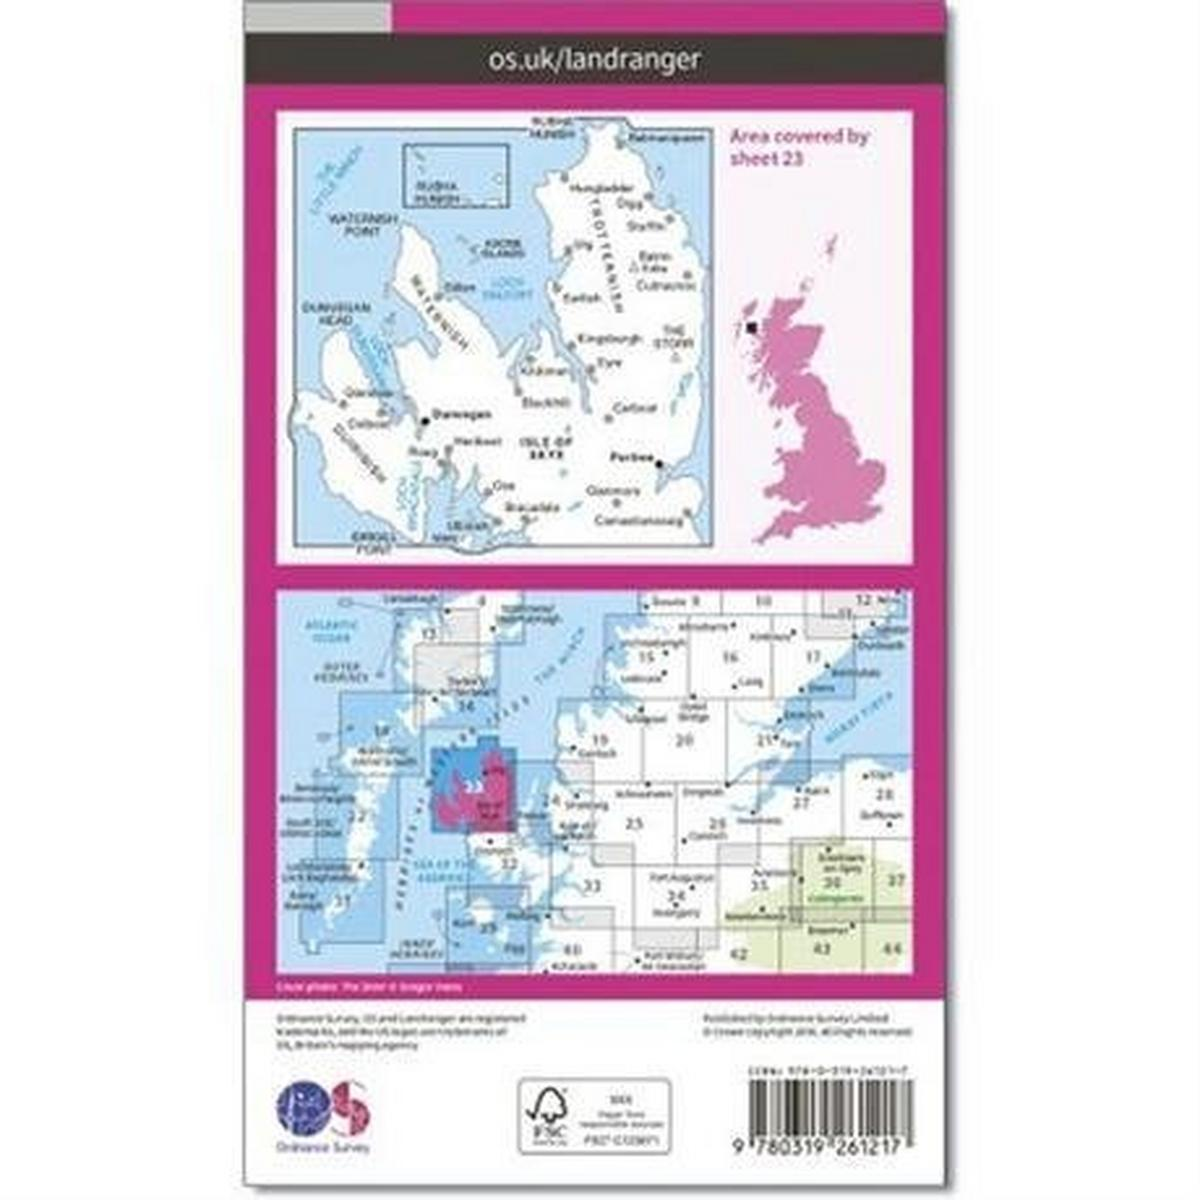 Ordnance Survey OS Landranger Map 23 North Skye, Dunvegan & Portree